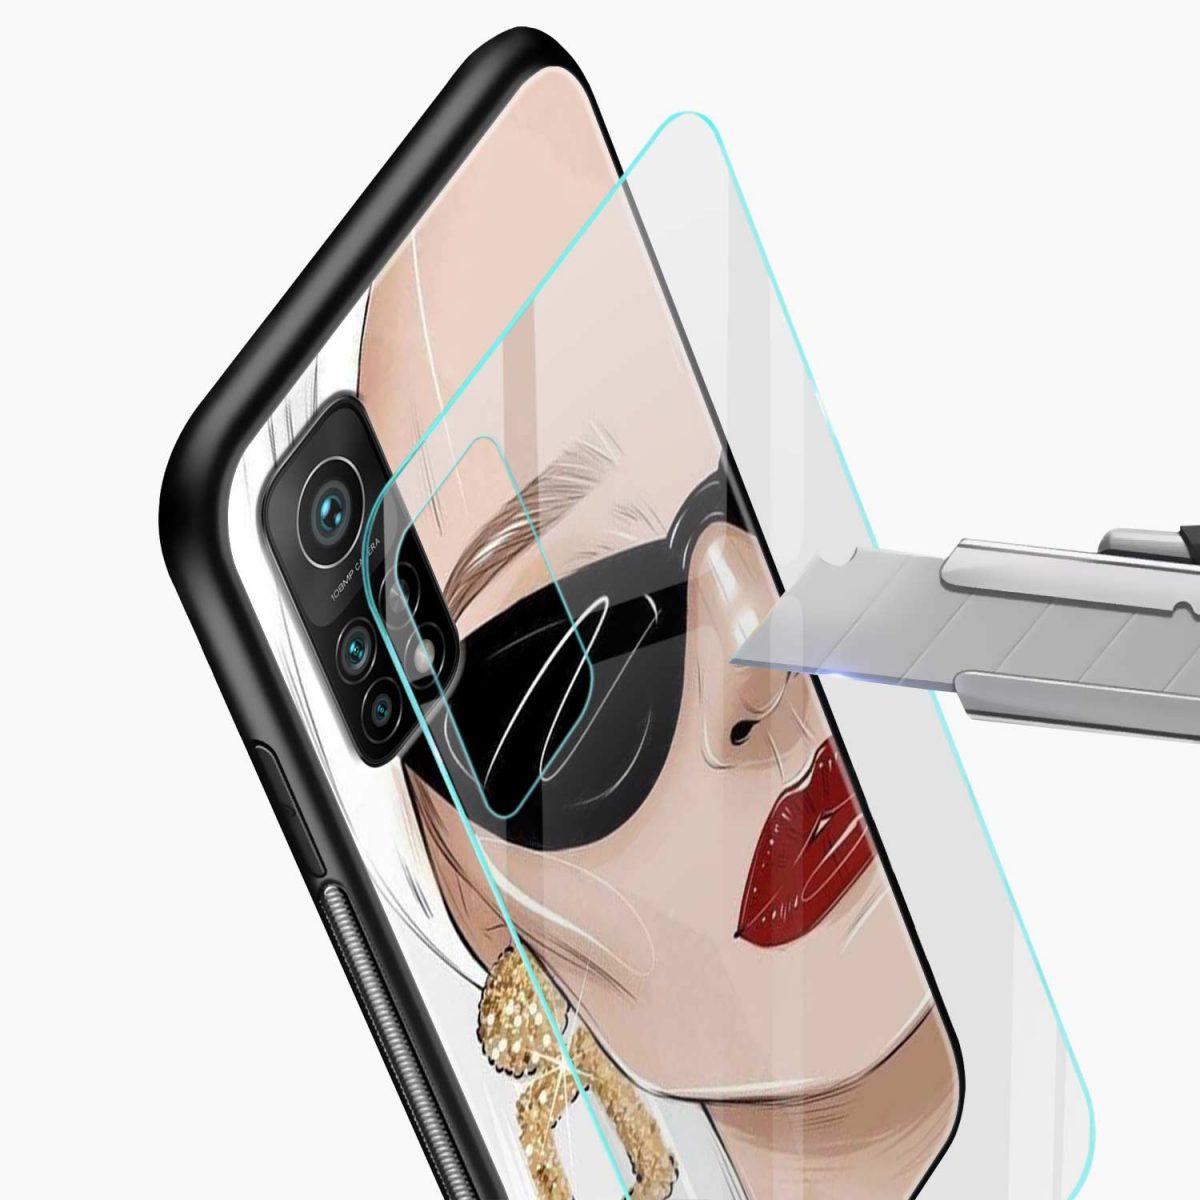 stylish women xiaomi mi 10t pro back cover glass view